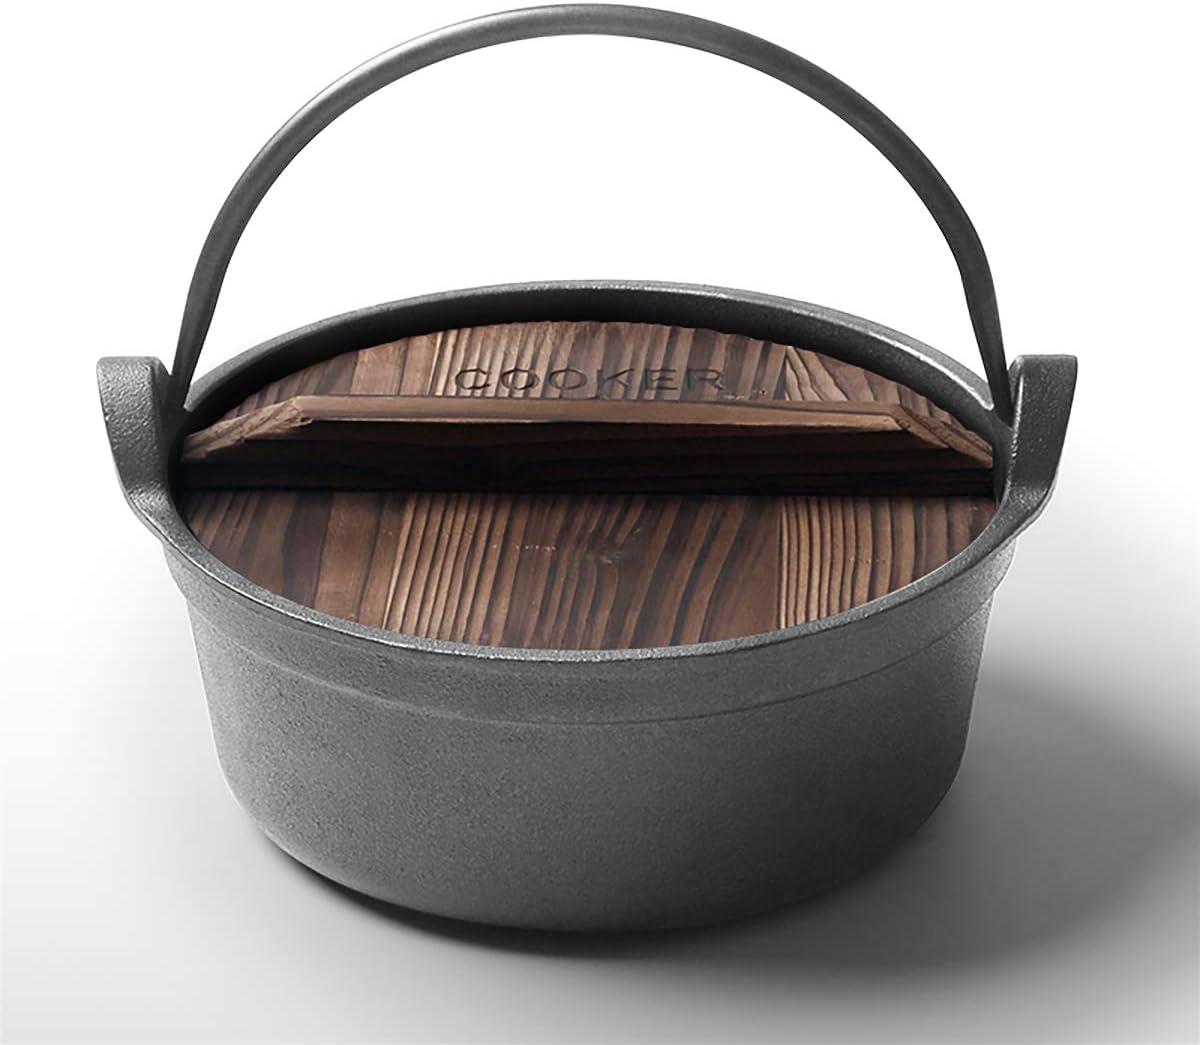 Cooker King - Utensilios de cocina (hierro fundido) Dutch Oven